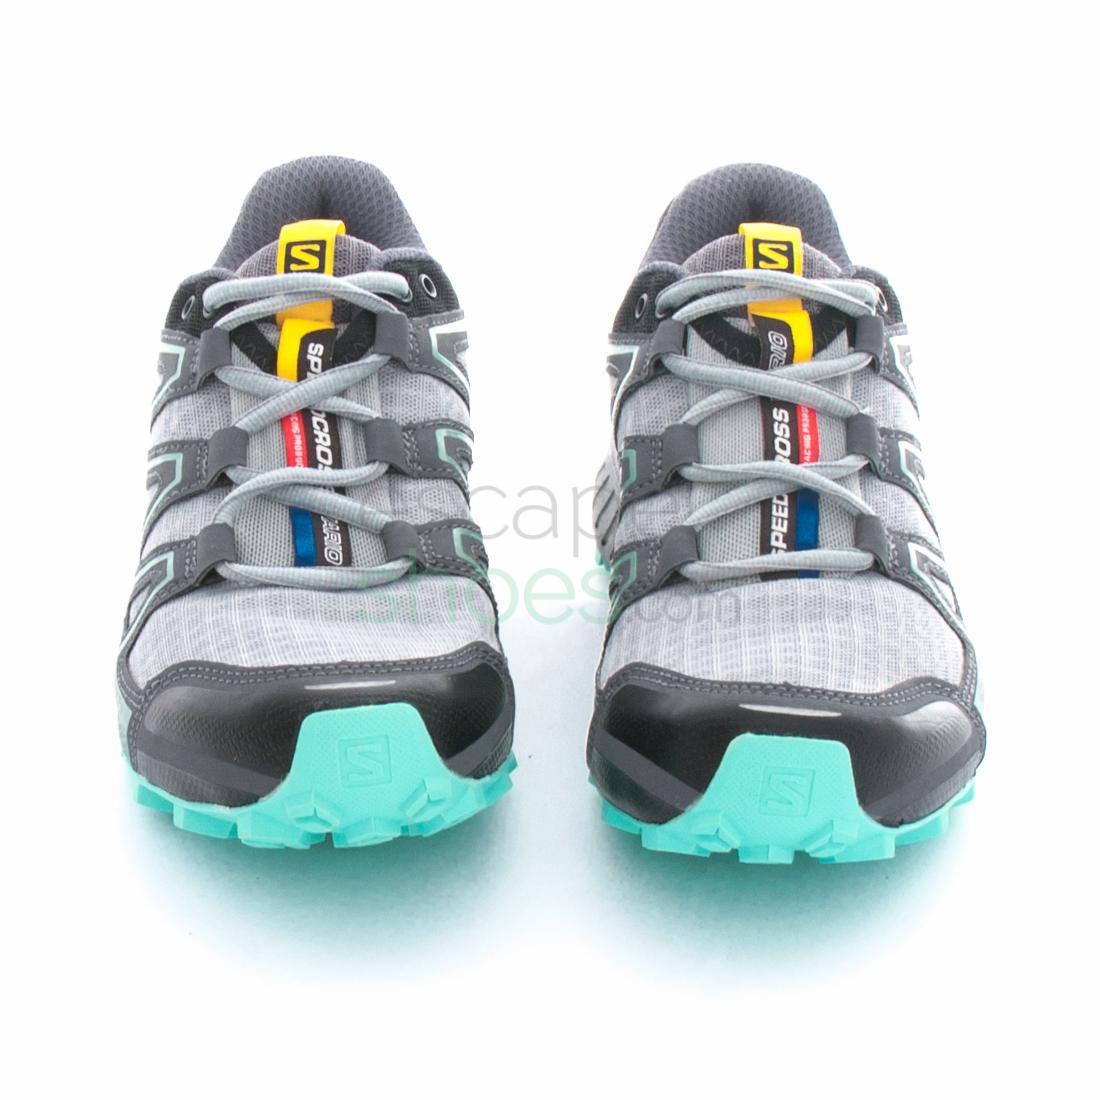 Sneakers SALOMON Speedcross Vario Light Onix Black Bubble